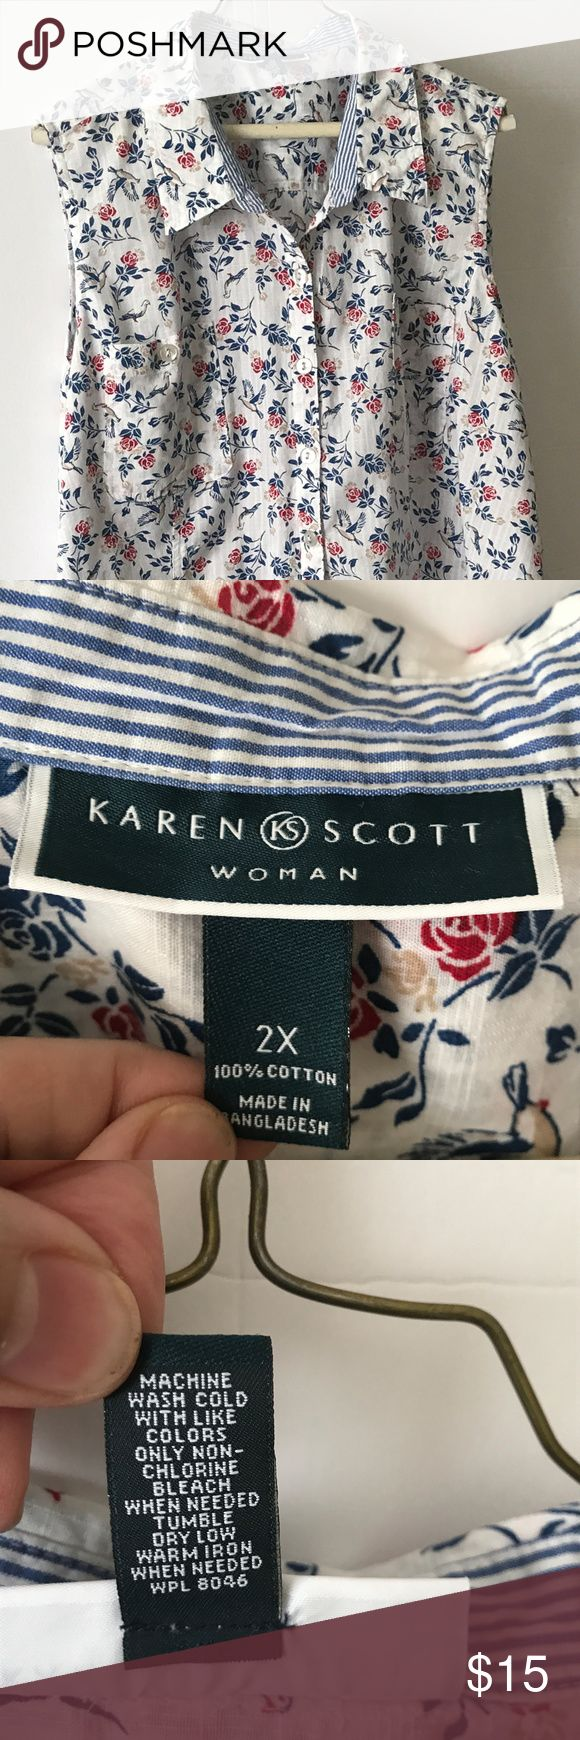 Karen Scott Woman Sleeveless Summer Blouse Size 2X Comfortable Karen Scott Woman blouse. Sleeveless, size 2X. Two breast pockets. Worn 1 season. EUC! Karen Scott Woman Tops Blouses